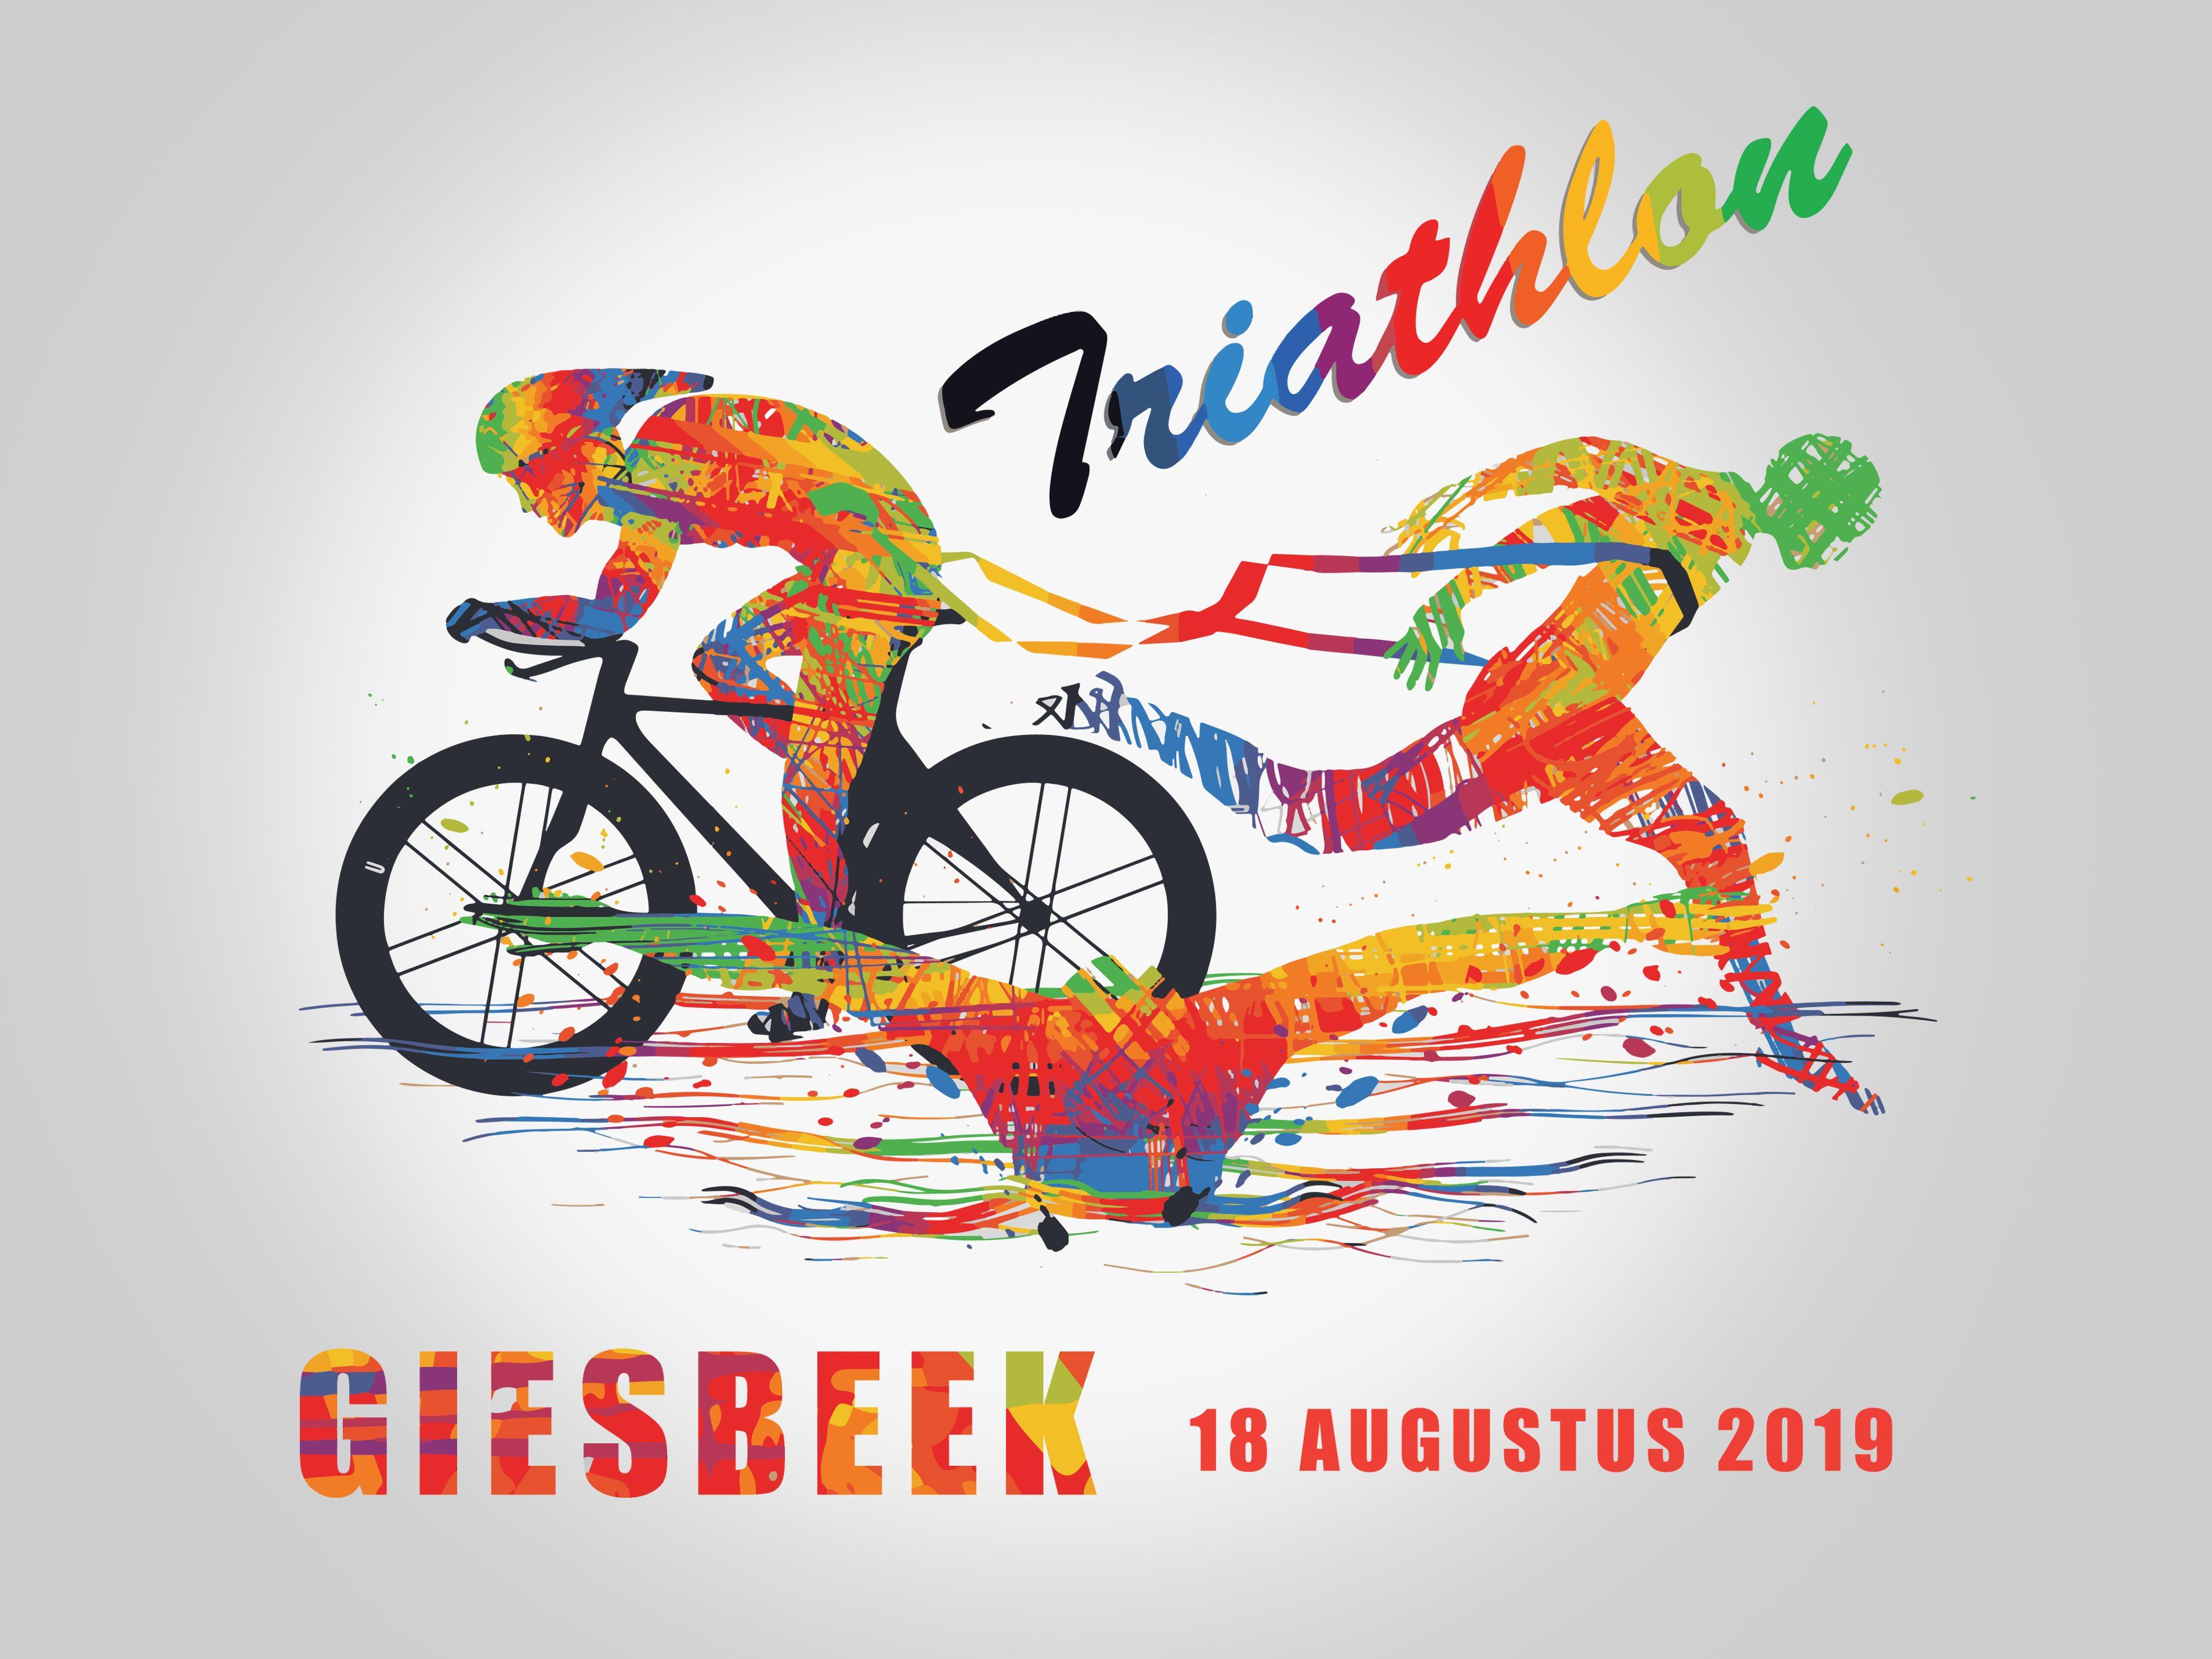 Giesbeek Triathlon, 18 augustus 2019